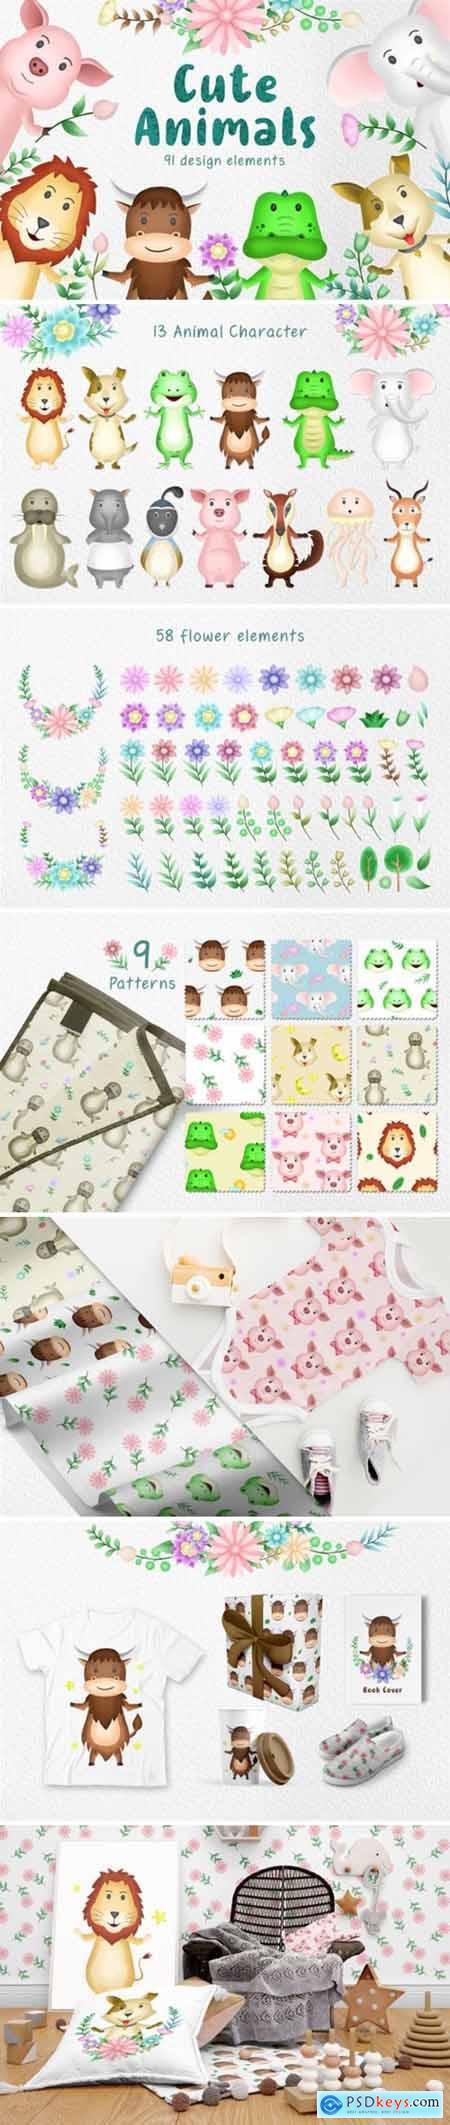 Cute Animals 3943393